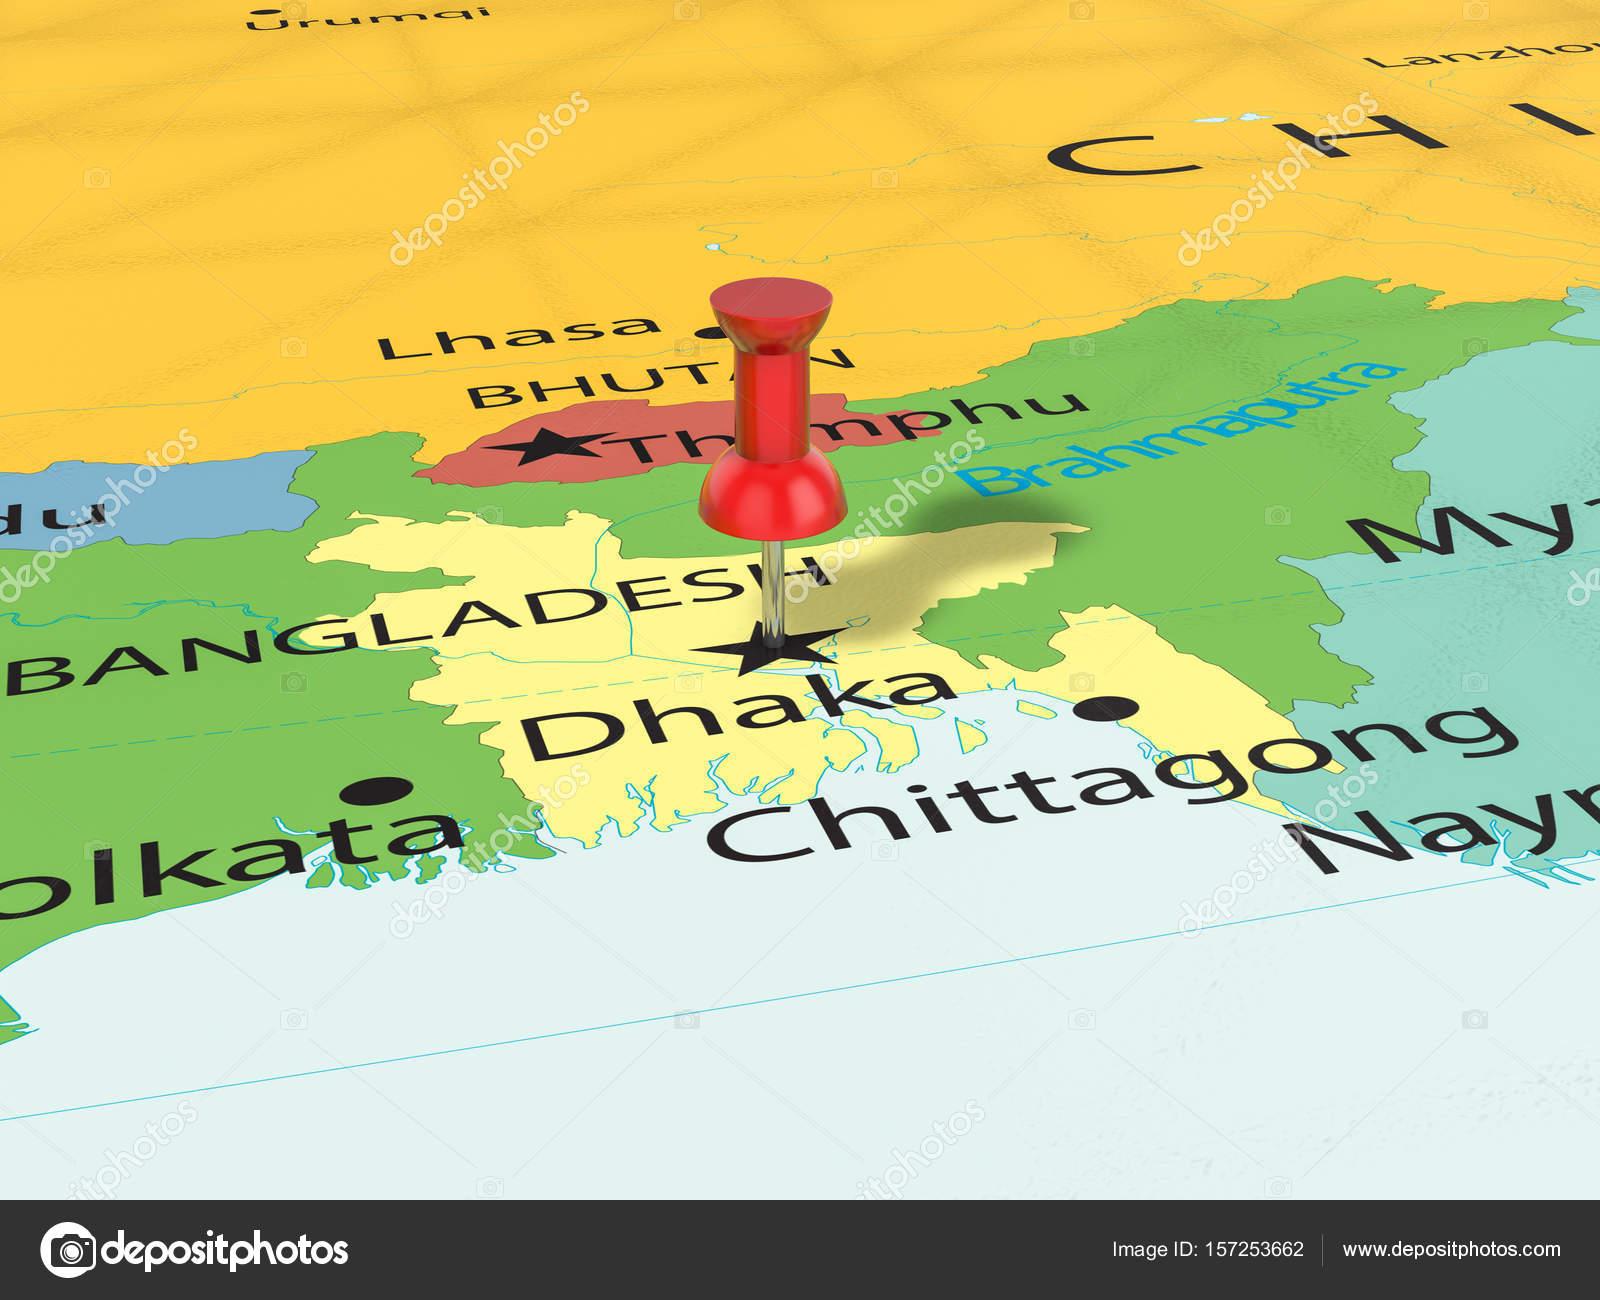 Pushpin on Dhaka map — Stock Photo © julydfg #157253662